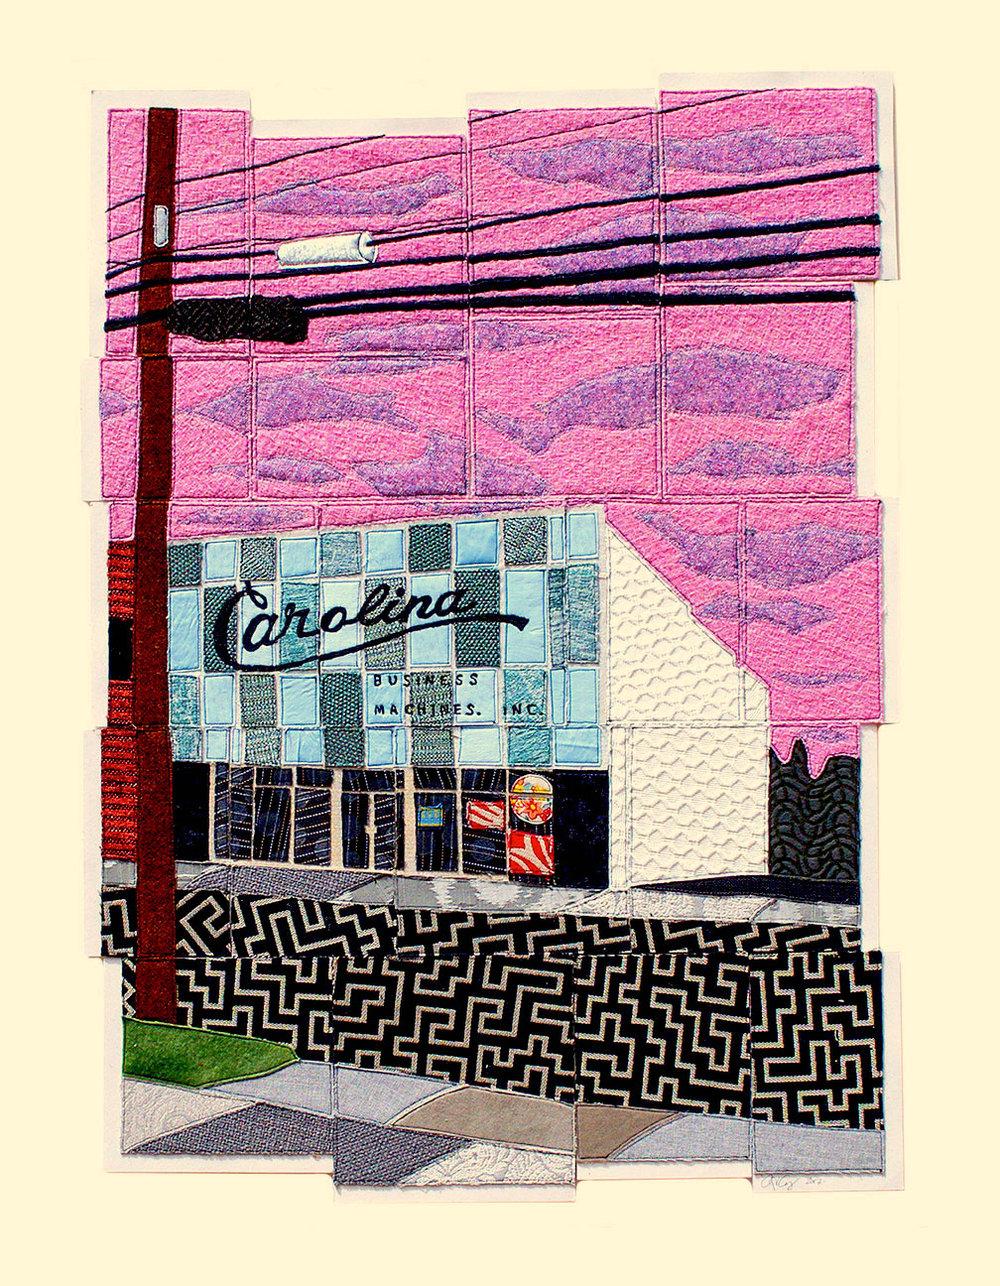 Carolina Business Machines, Wilkesboro, NC 2017